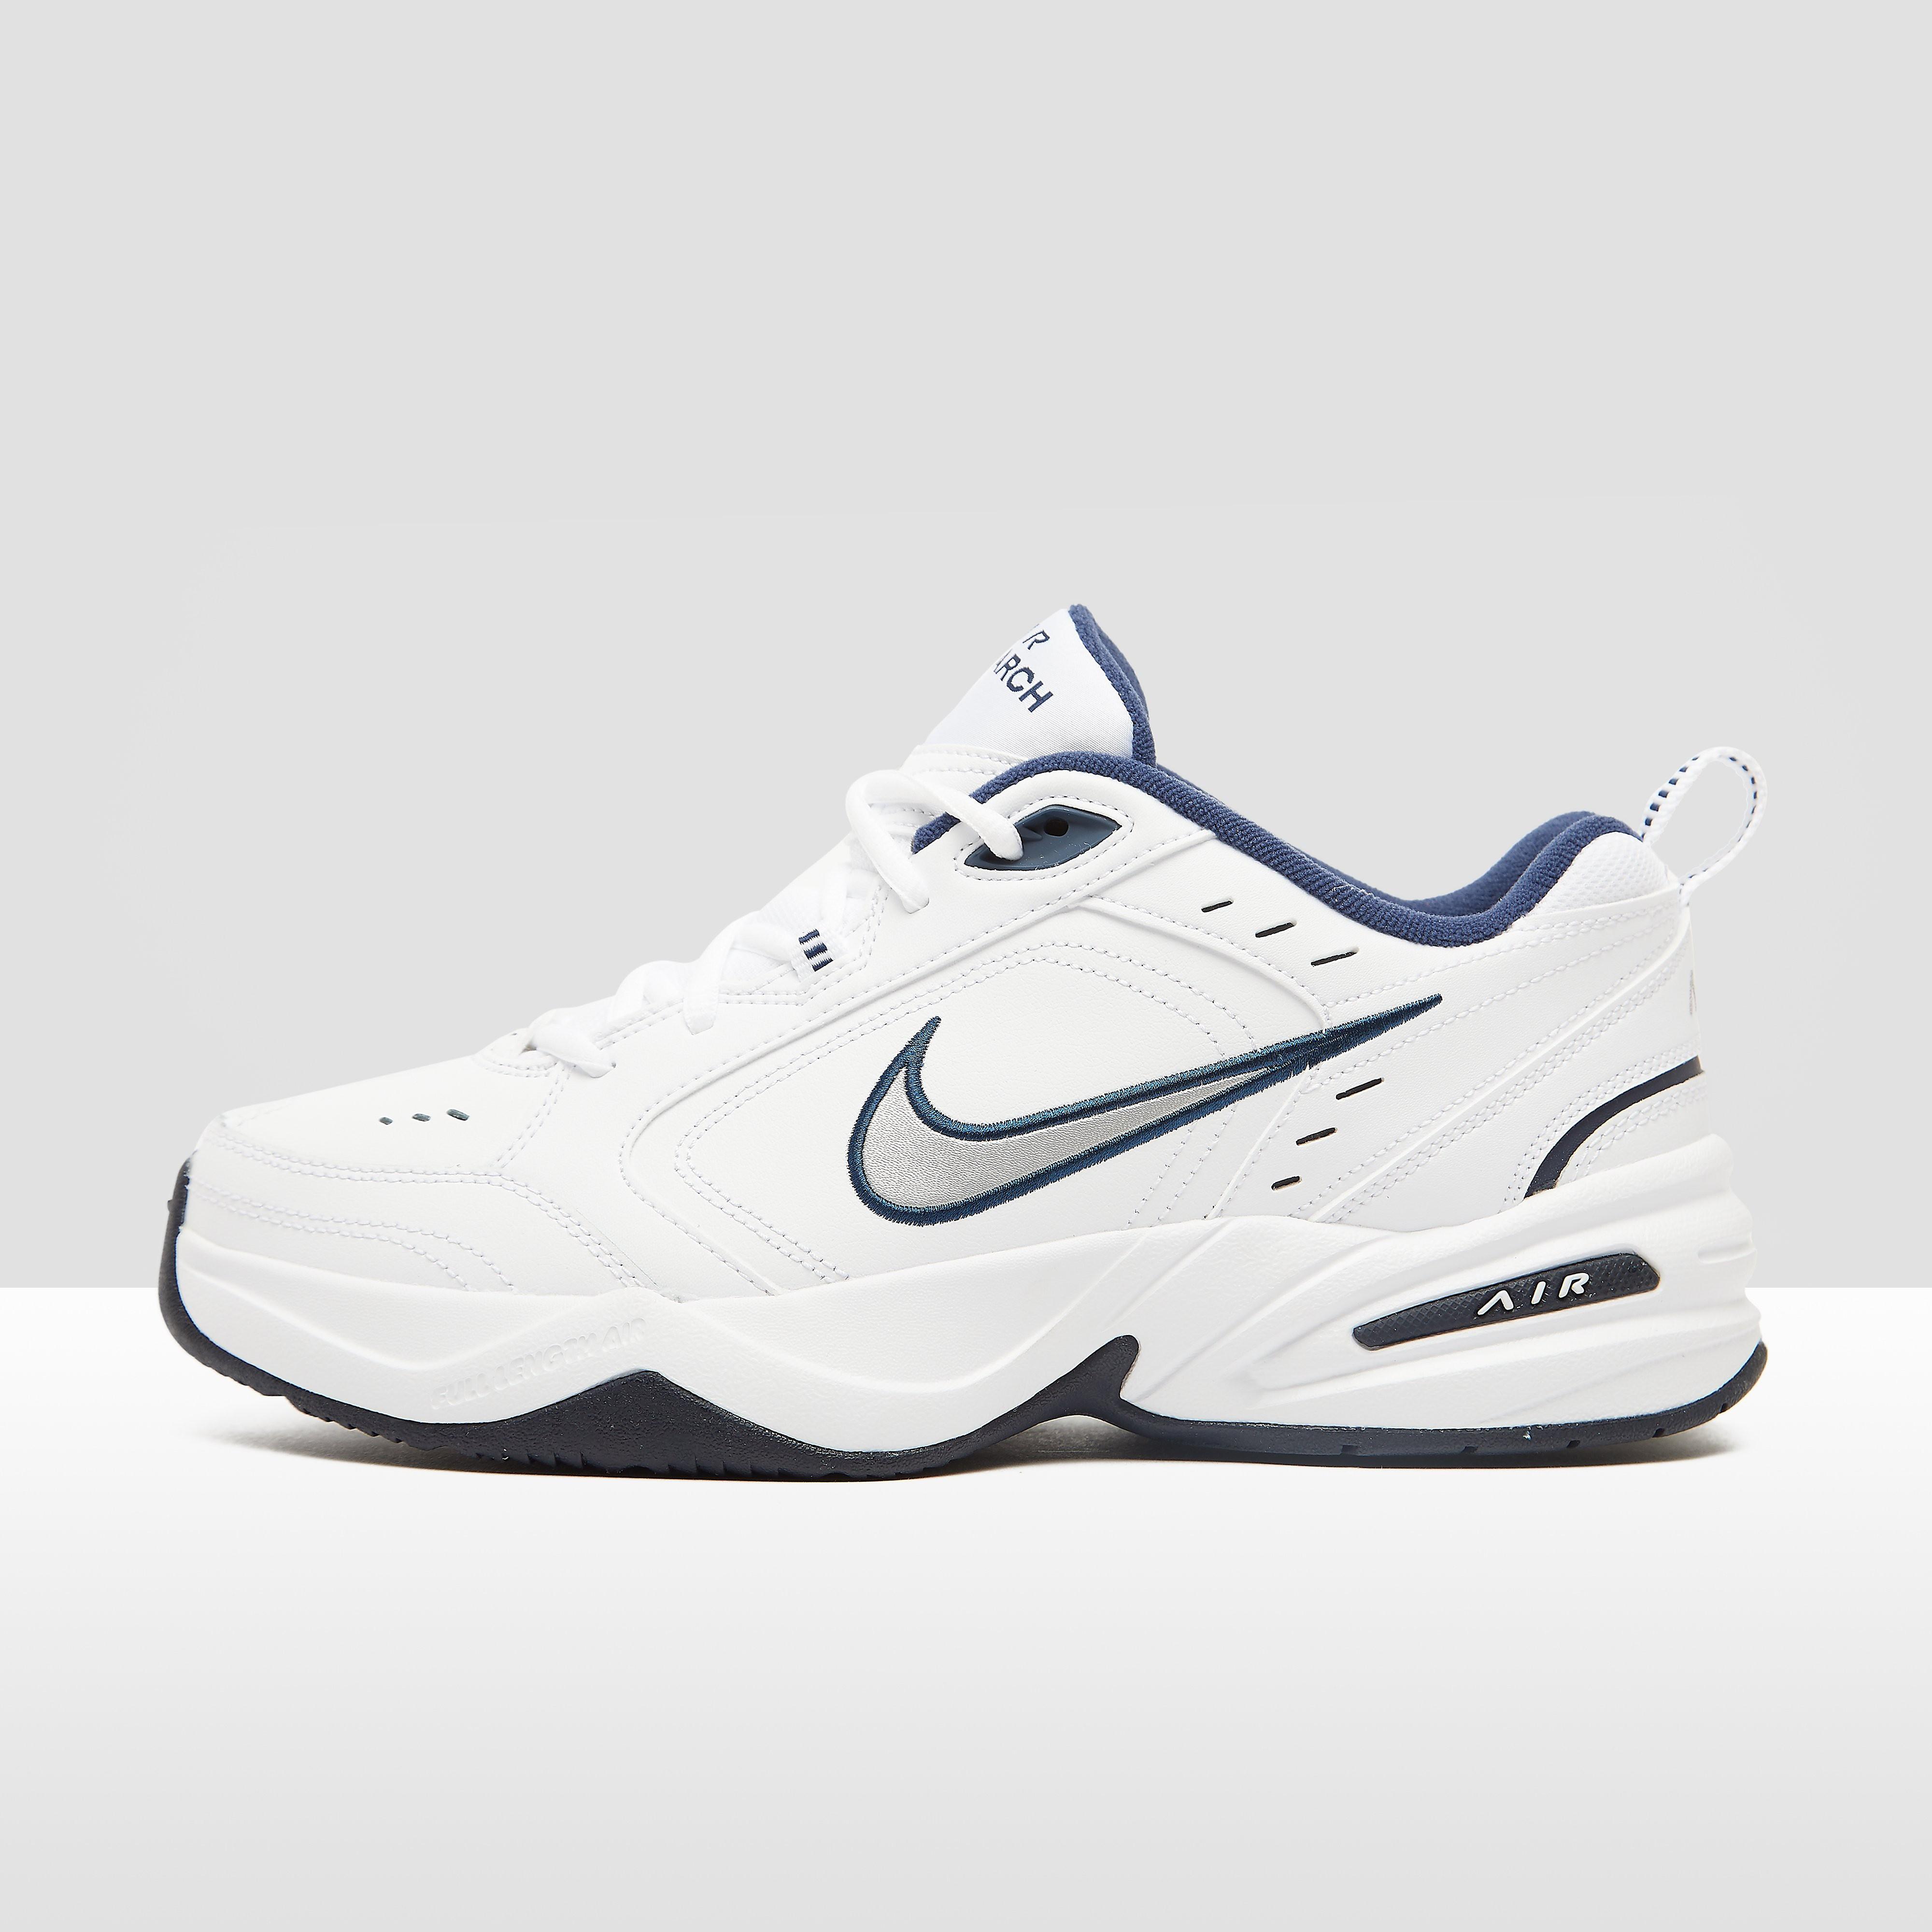 NIKE Chunky air monarch iv sneakers wit/blauw heren Heren